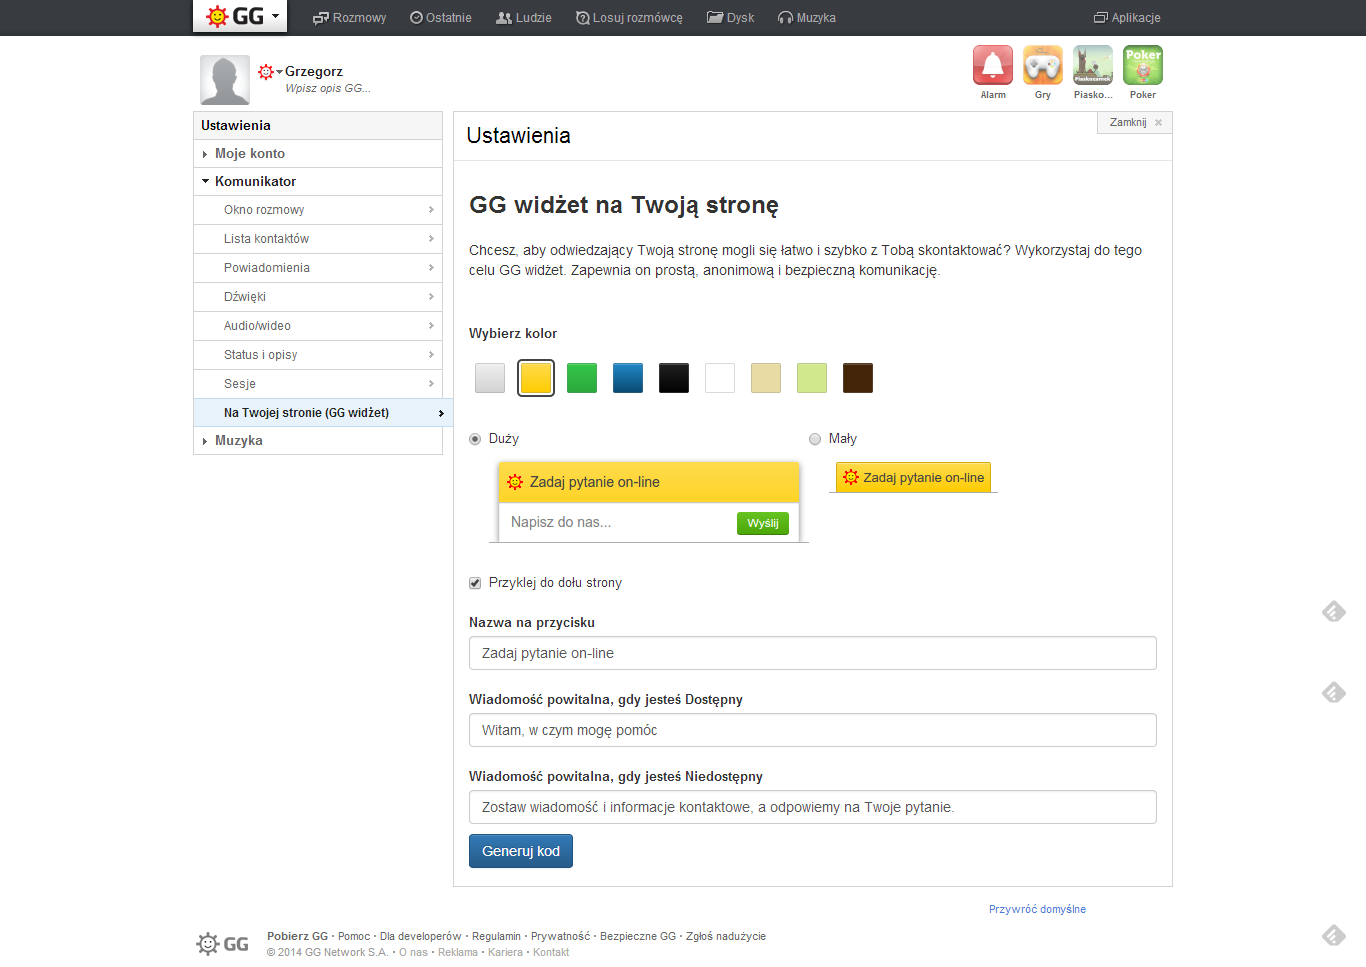 screenshot-www.gg.pl 2014-12-15 12-46-48 (1)